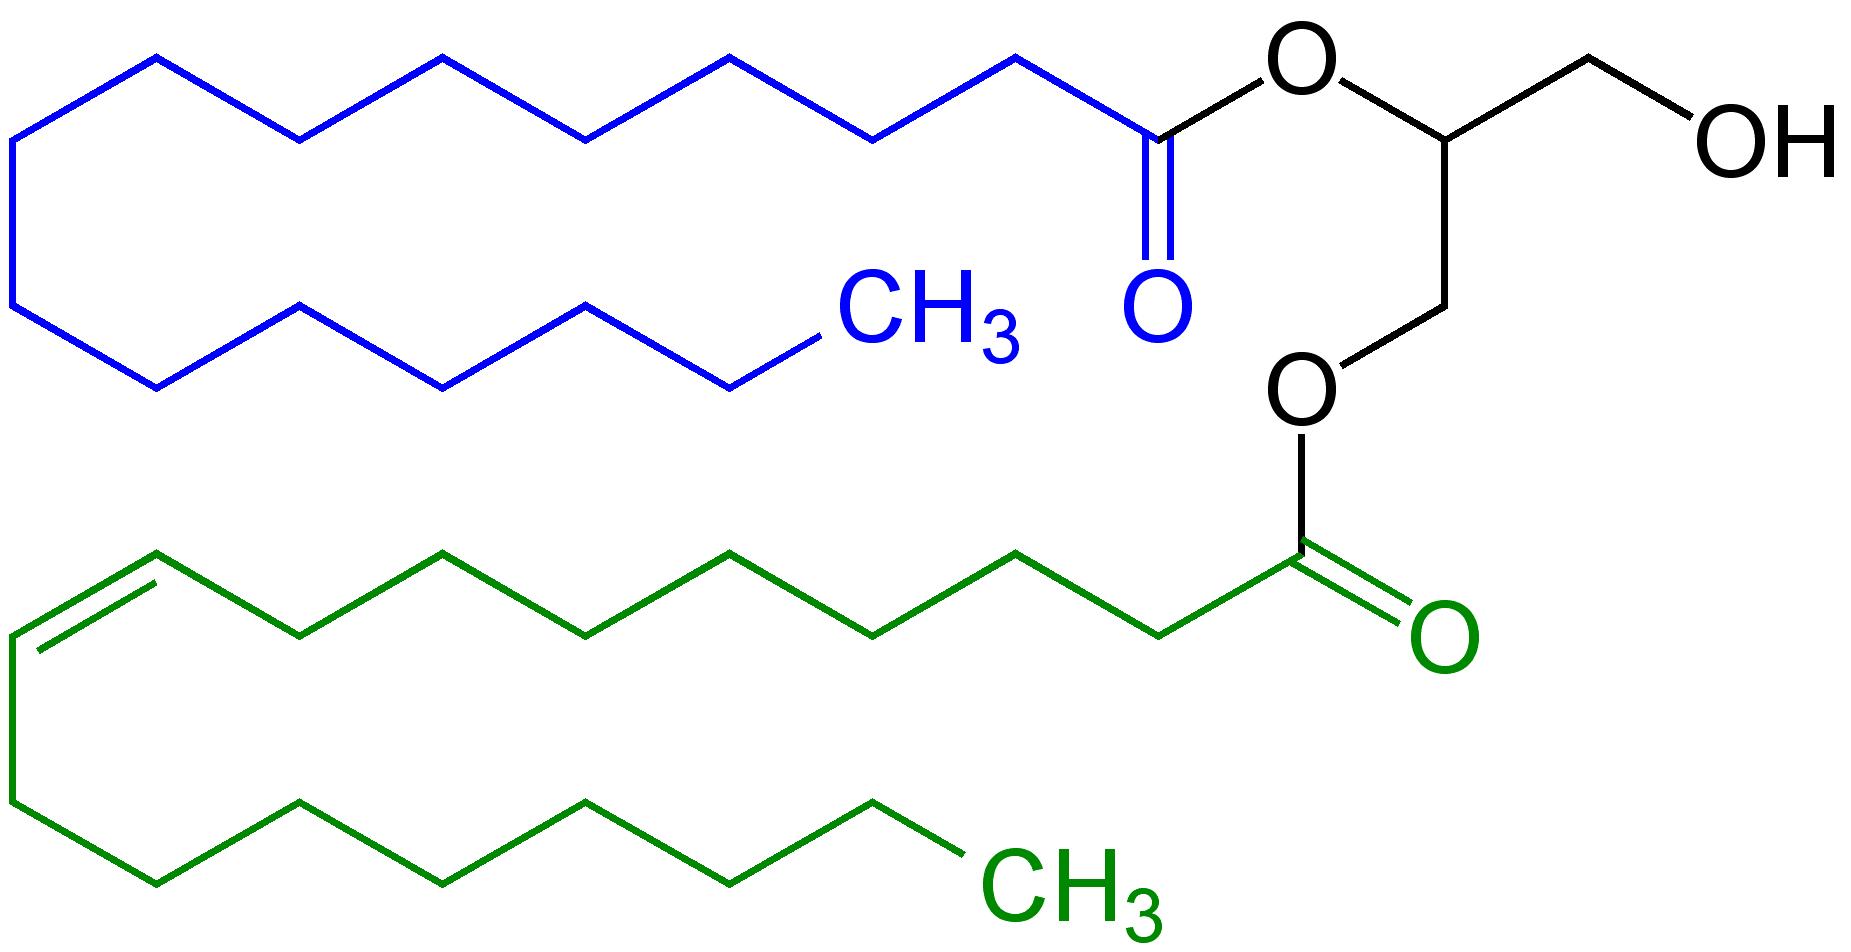 Mono- and diglycerides of fatty acids - Wikipedia